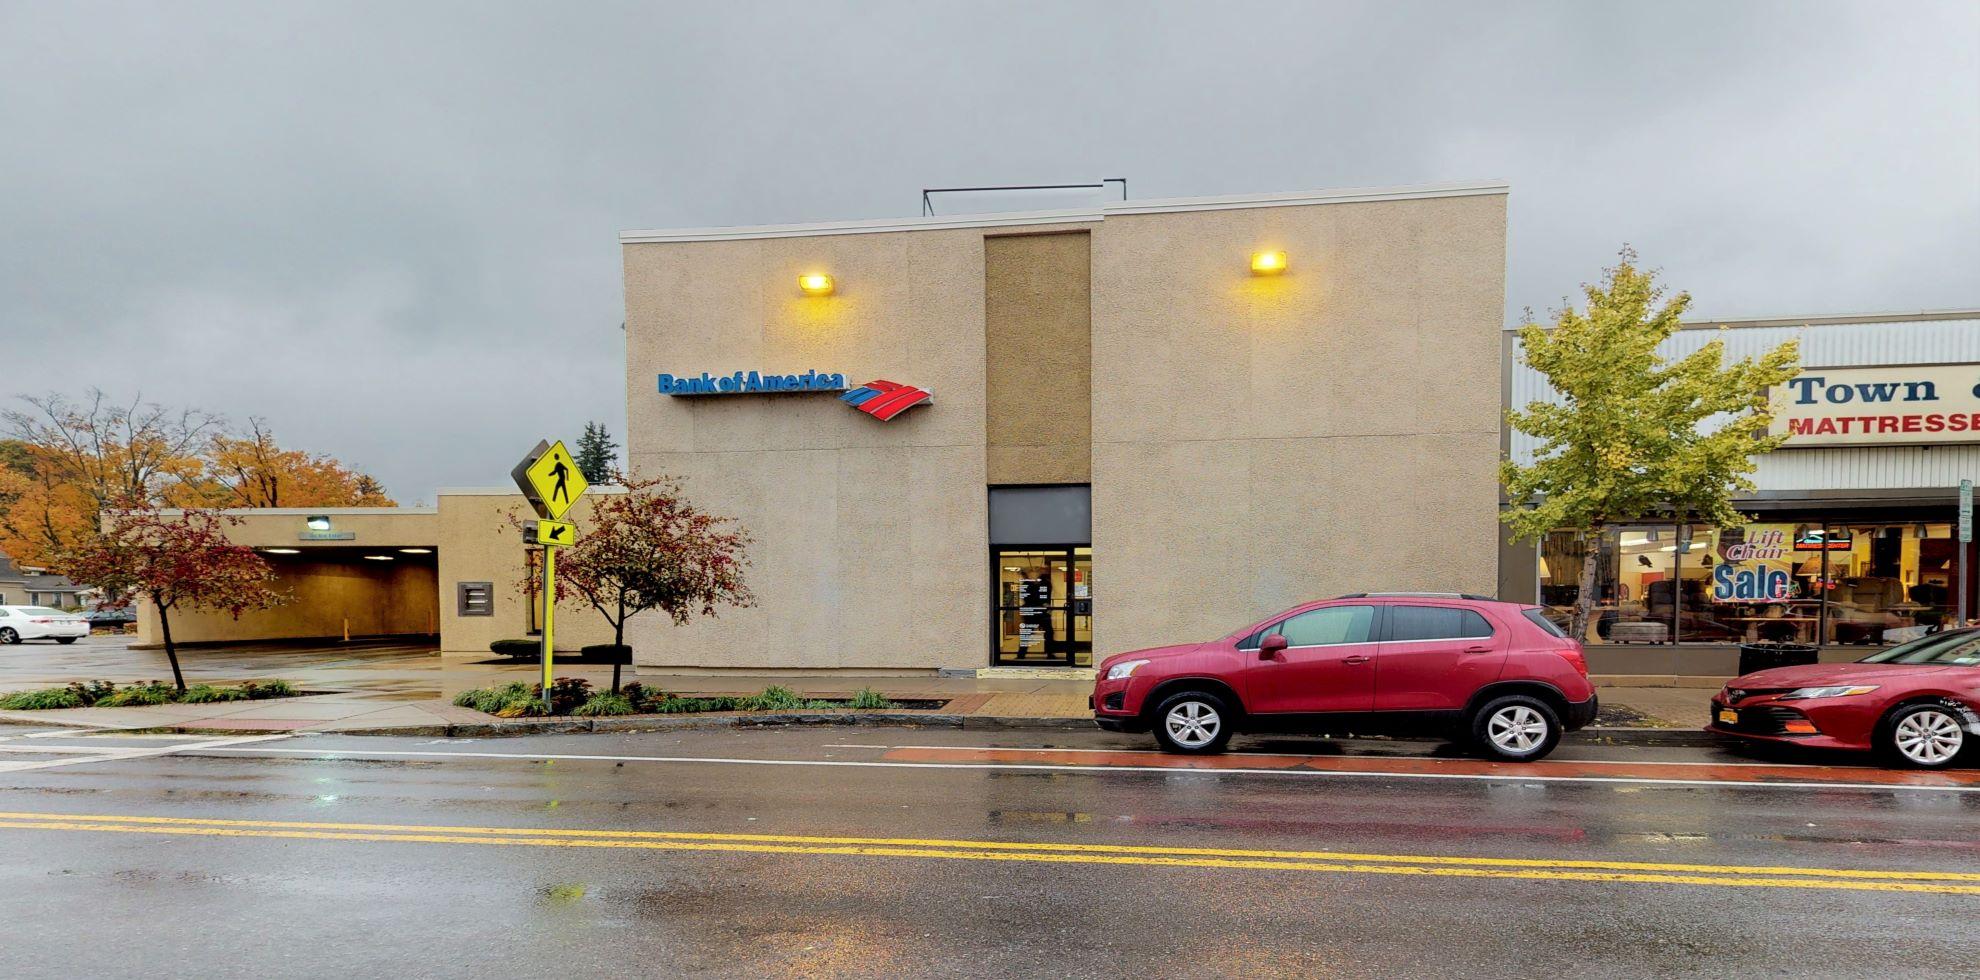 Bank of America financial center with drive-thru ATM   43 Main St, Hamburg, NY 14075